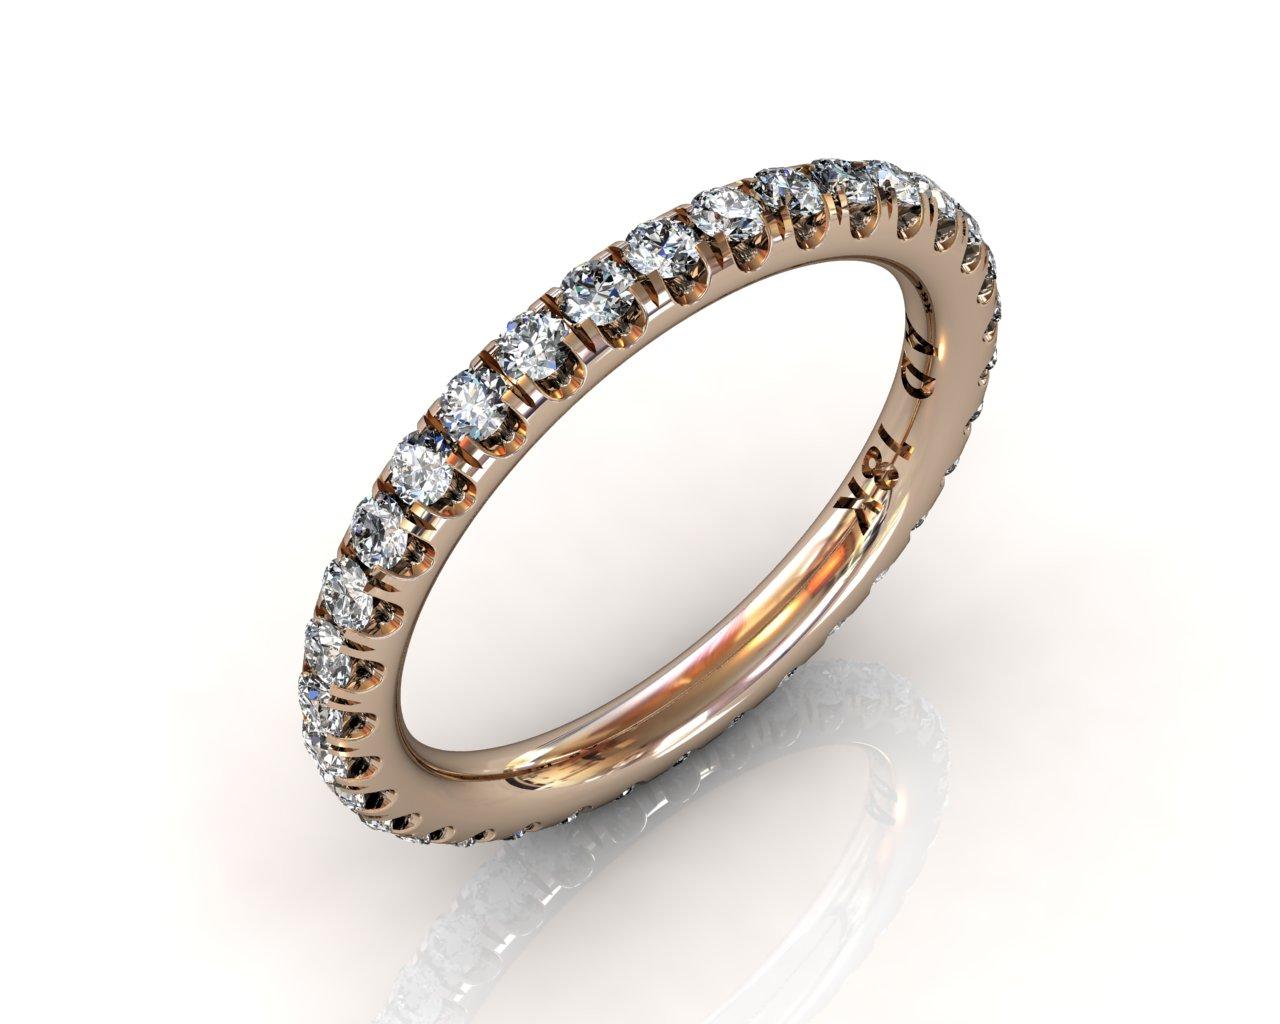 Wedding Bands Ladies Diamonds Craponia 24 Stone 0.74 TCW 3.0g 18kt Rose Gold